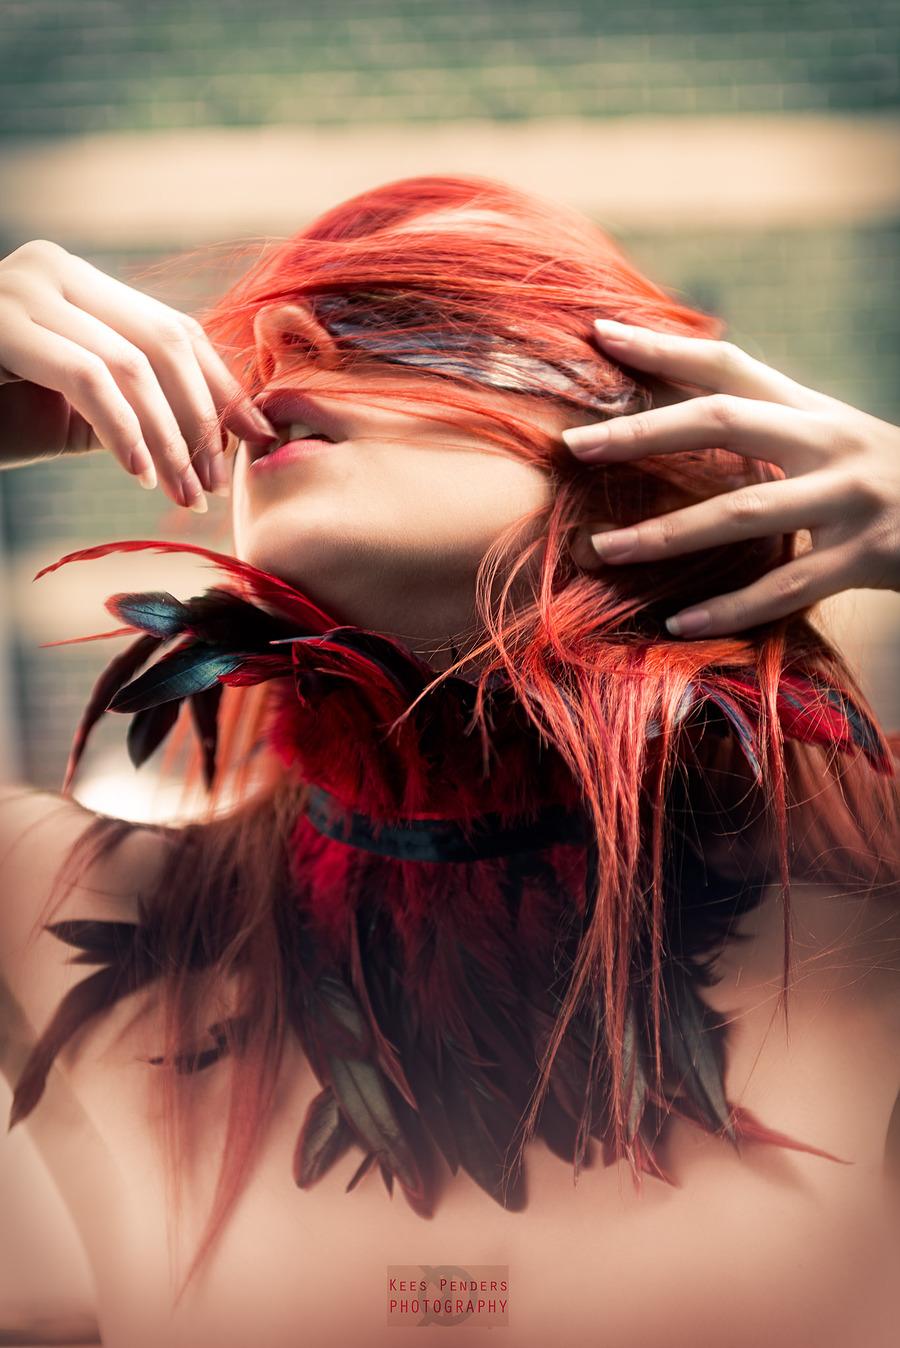 Senses / Photography by KPF, Model Freya, Makeup by Freya, Stylist Freya / Uploaded 29th May 2015 @ 04:59 PM